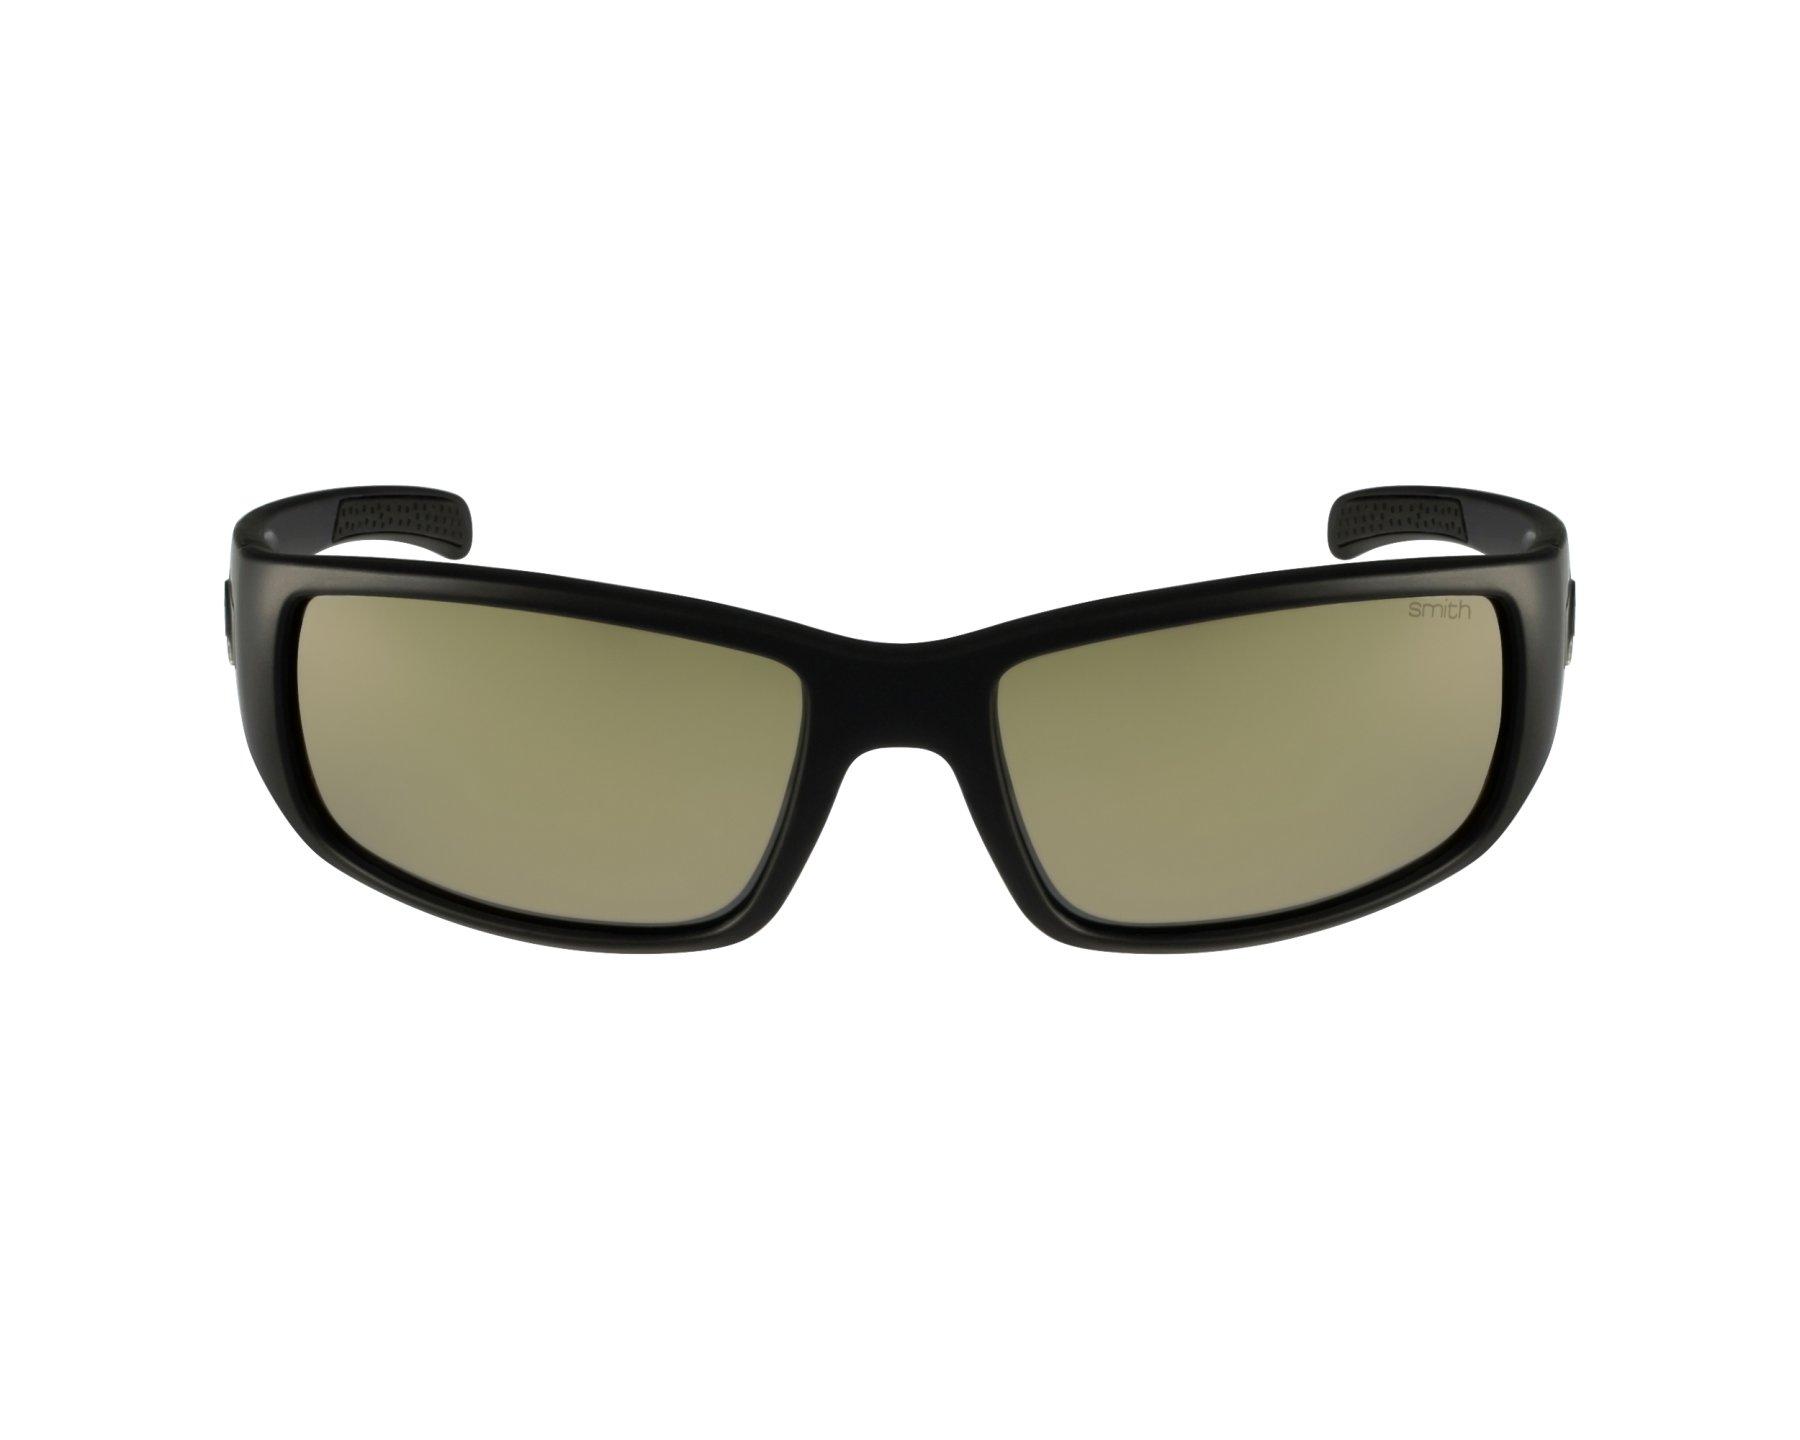 777050b78f Sunglasses Smith Optics Prospect DL5V8 - Black profile view